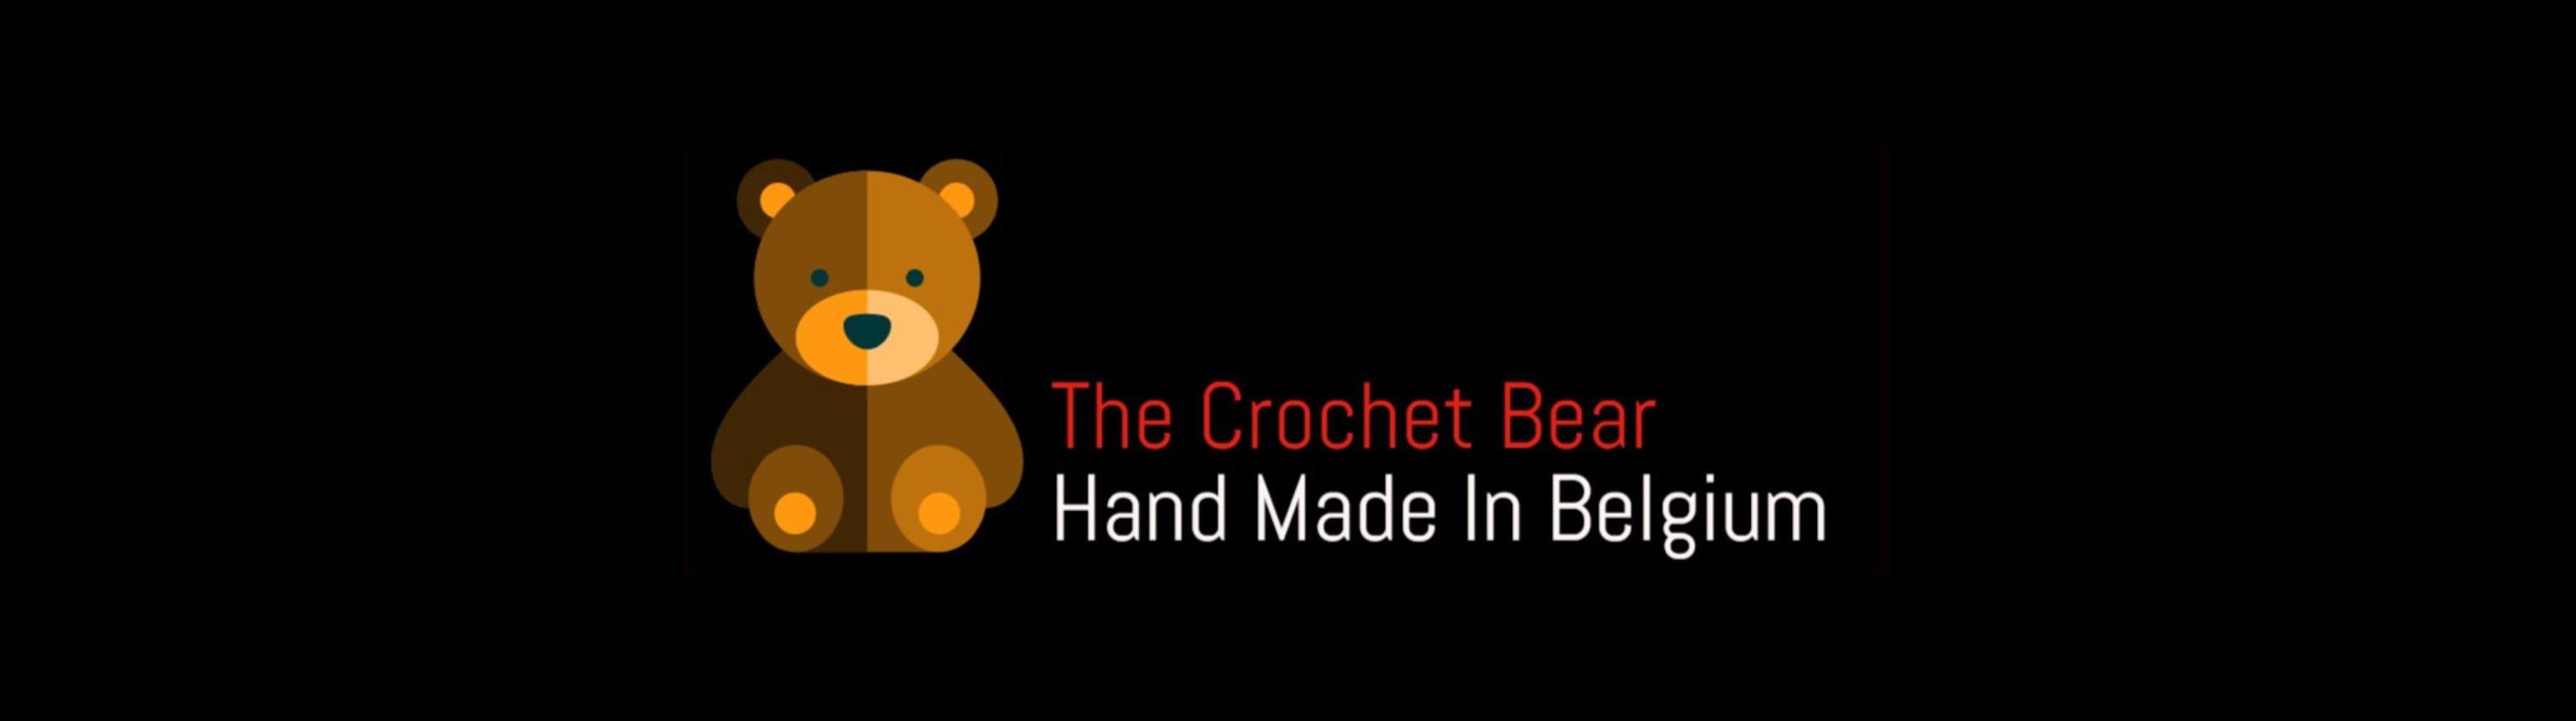 The Crochet Bear